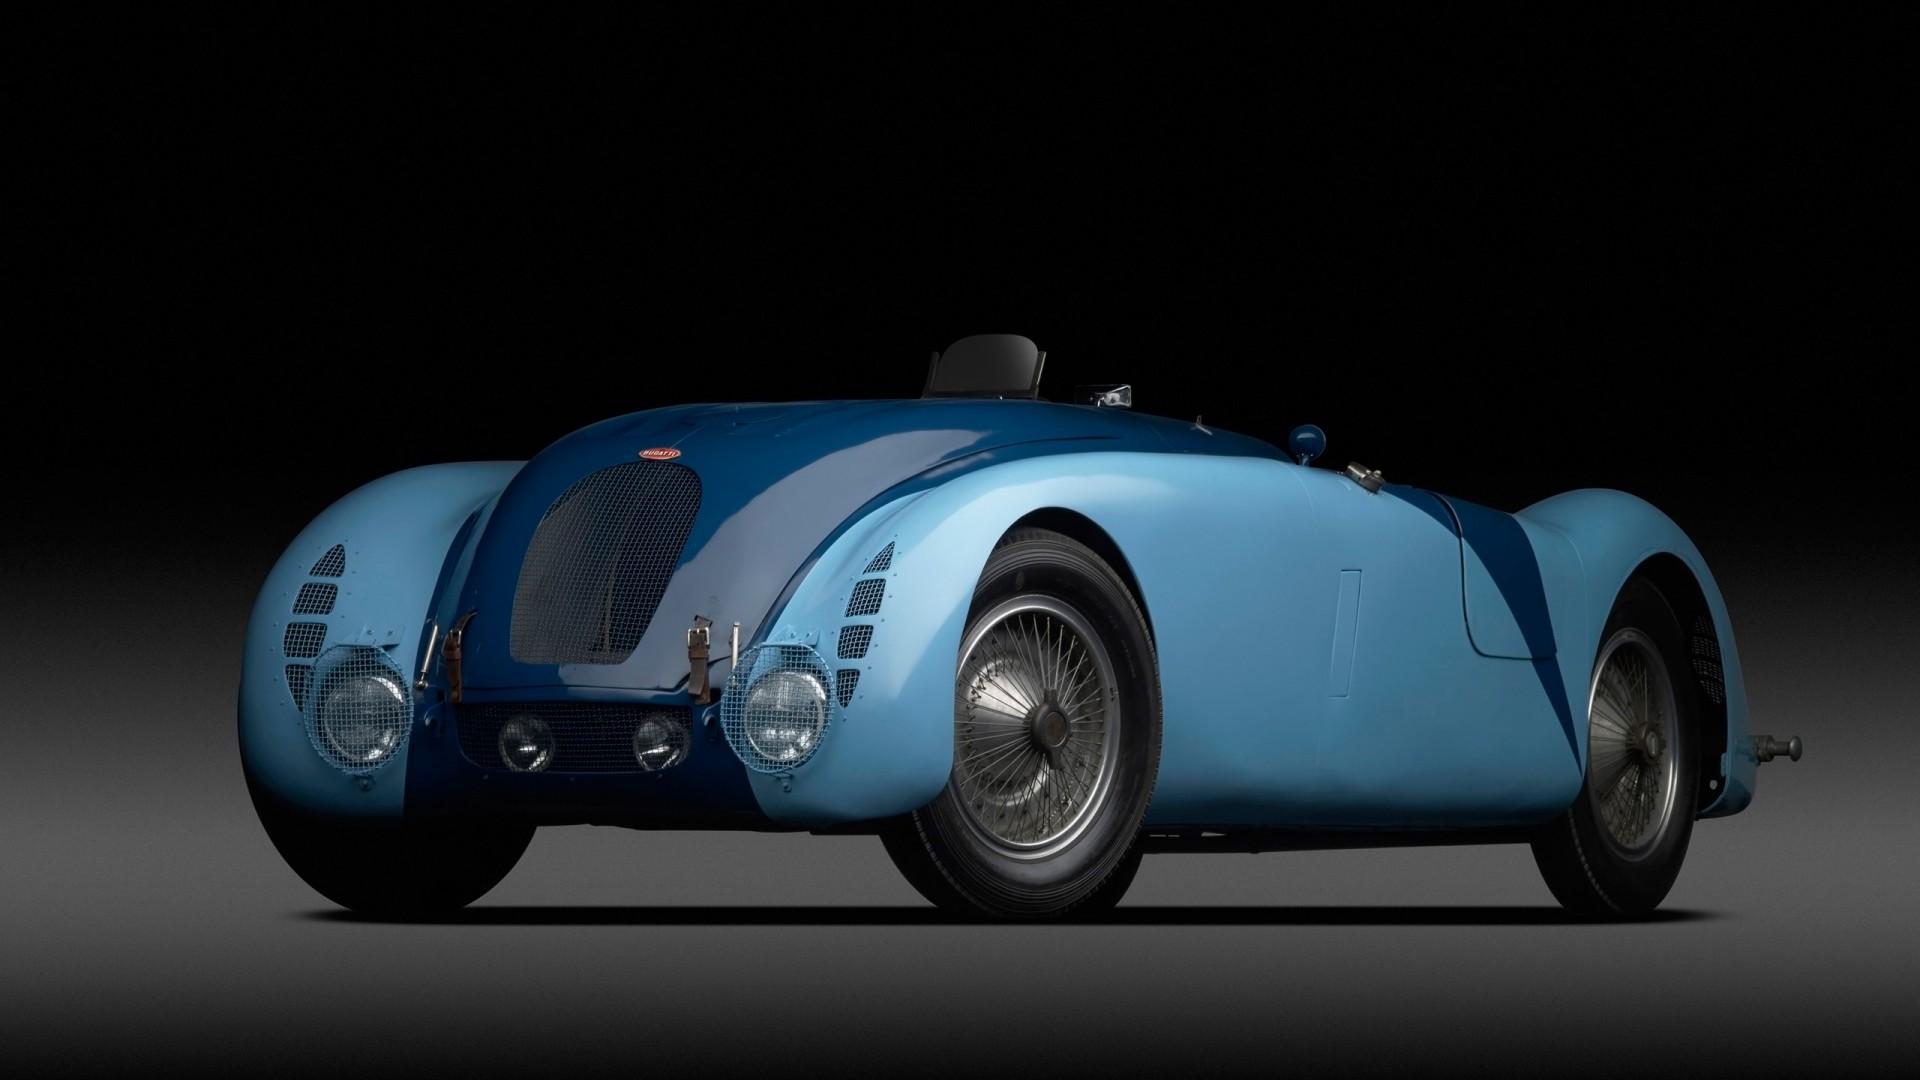 Bugatti Veyron Jean Pierre Wimille Legends Edition